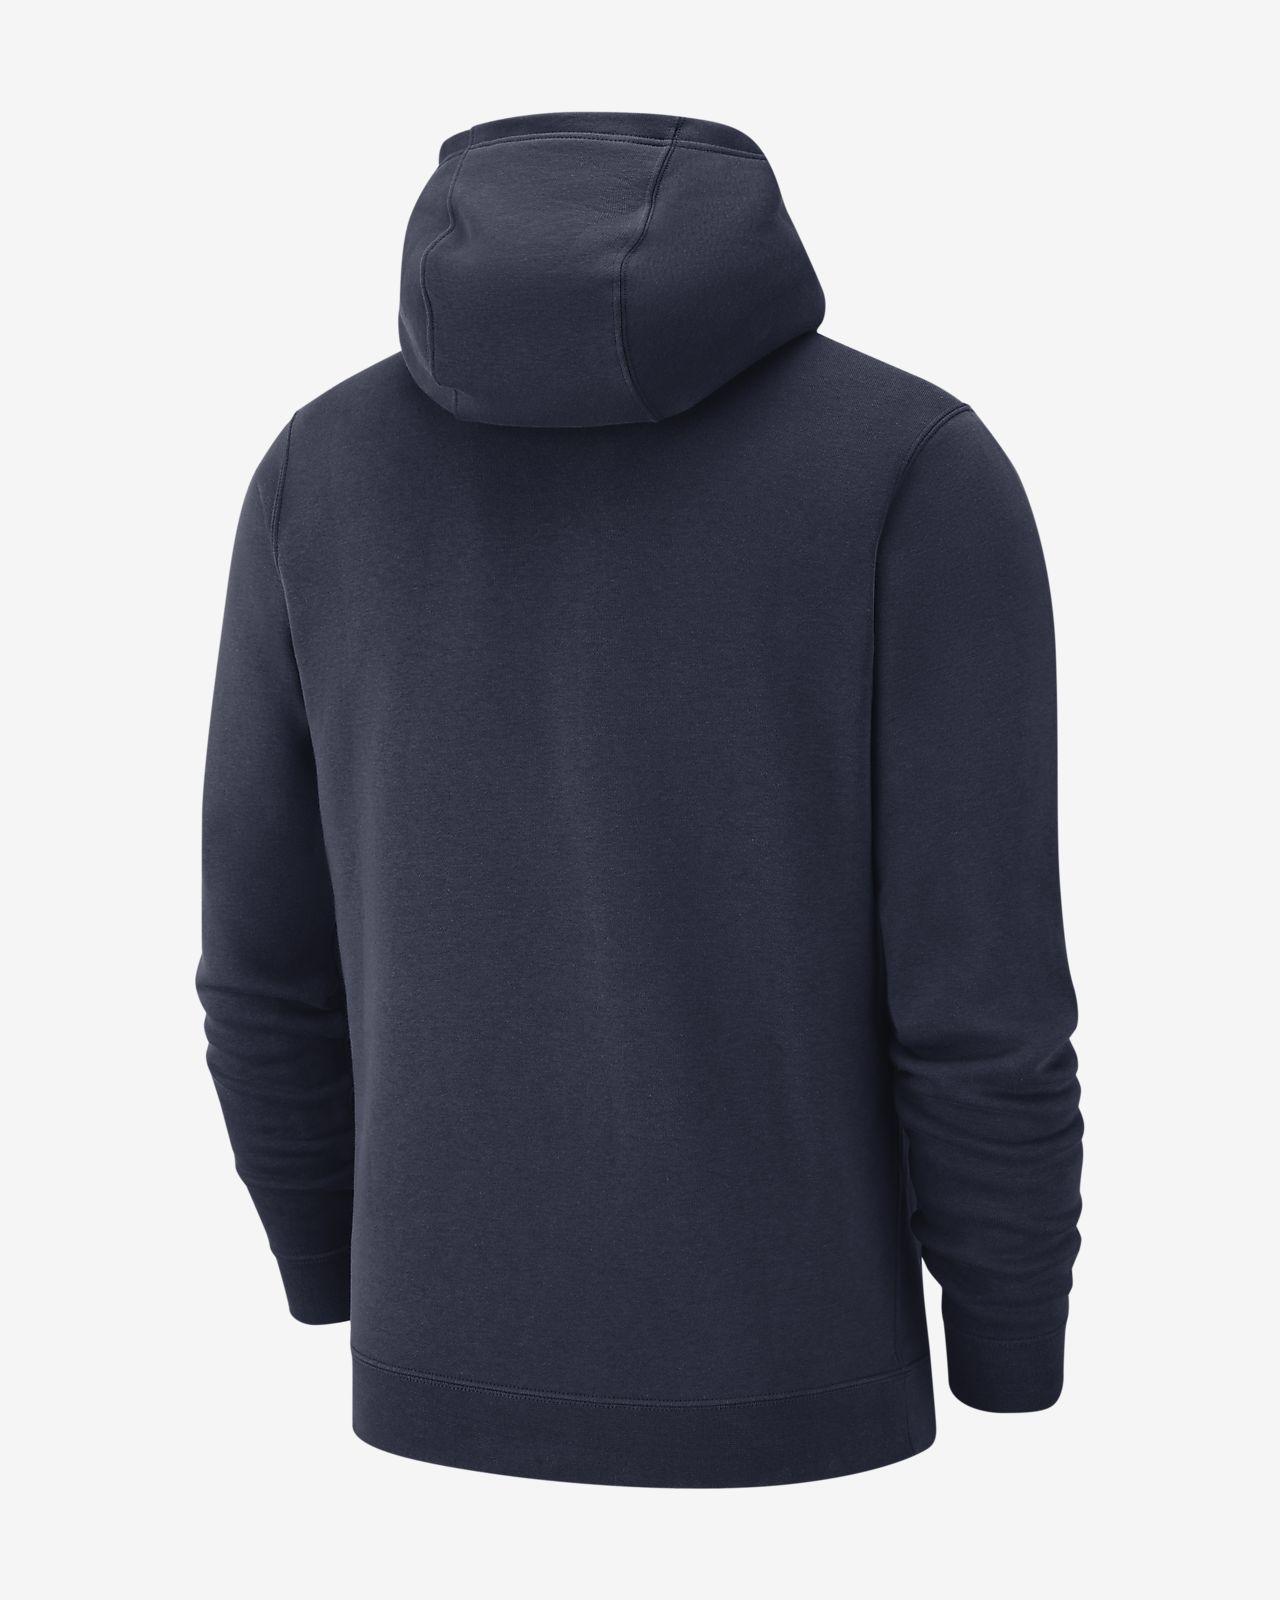 bb1c9a7dd493 Nike (NFL Titans) Men s Full-Zip Fleece Hoodie. Nike.com BE